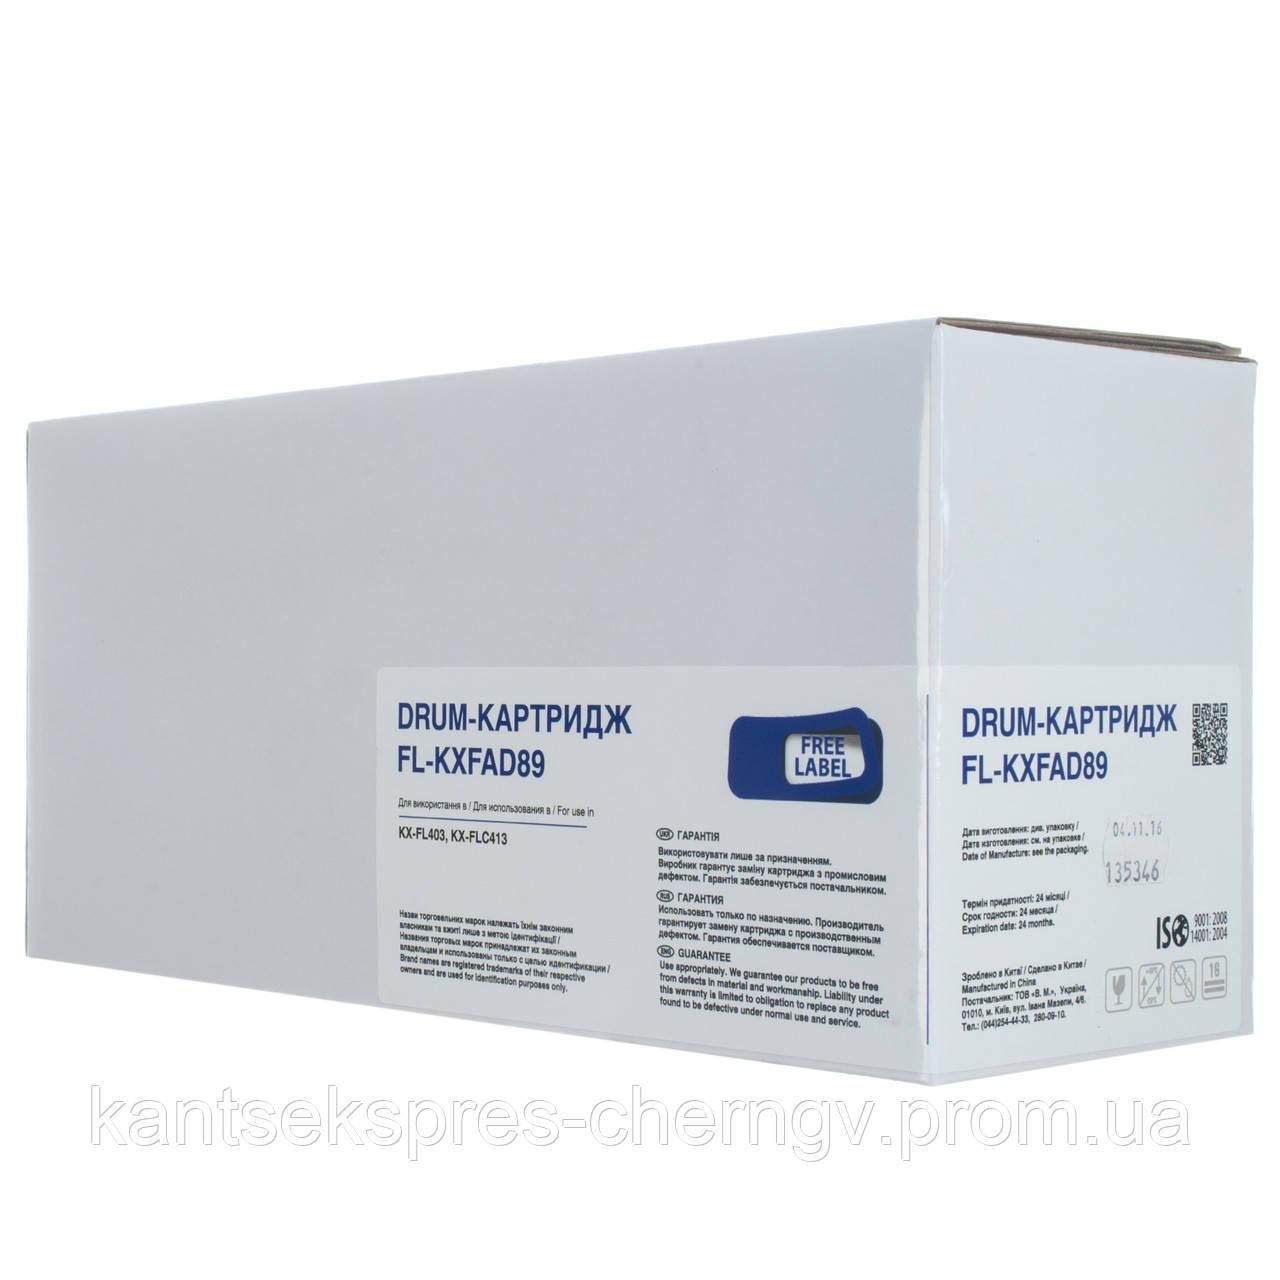 DRUM-КАРТРИДЖ PANASONIC KX-FAD89 (FL-KXFAD89) FREE Label